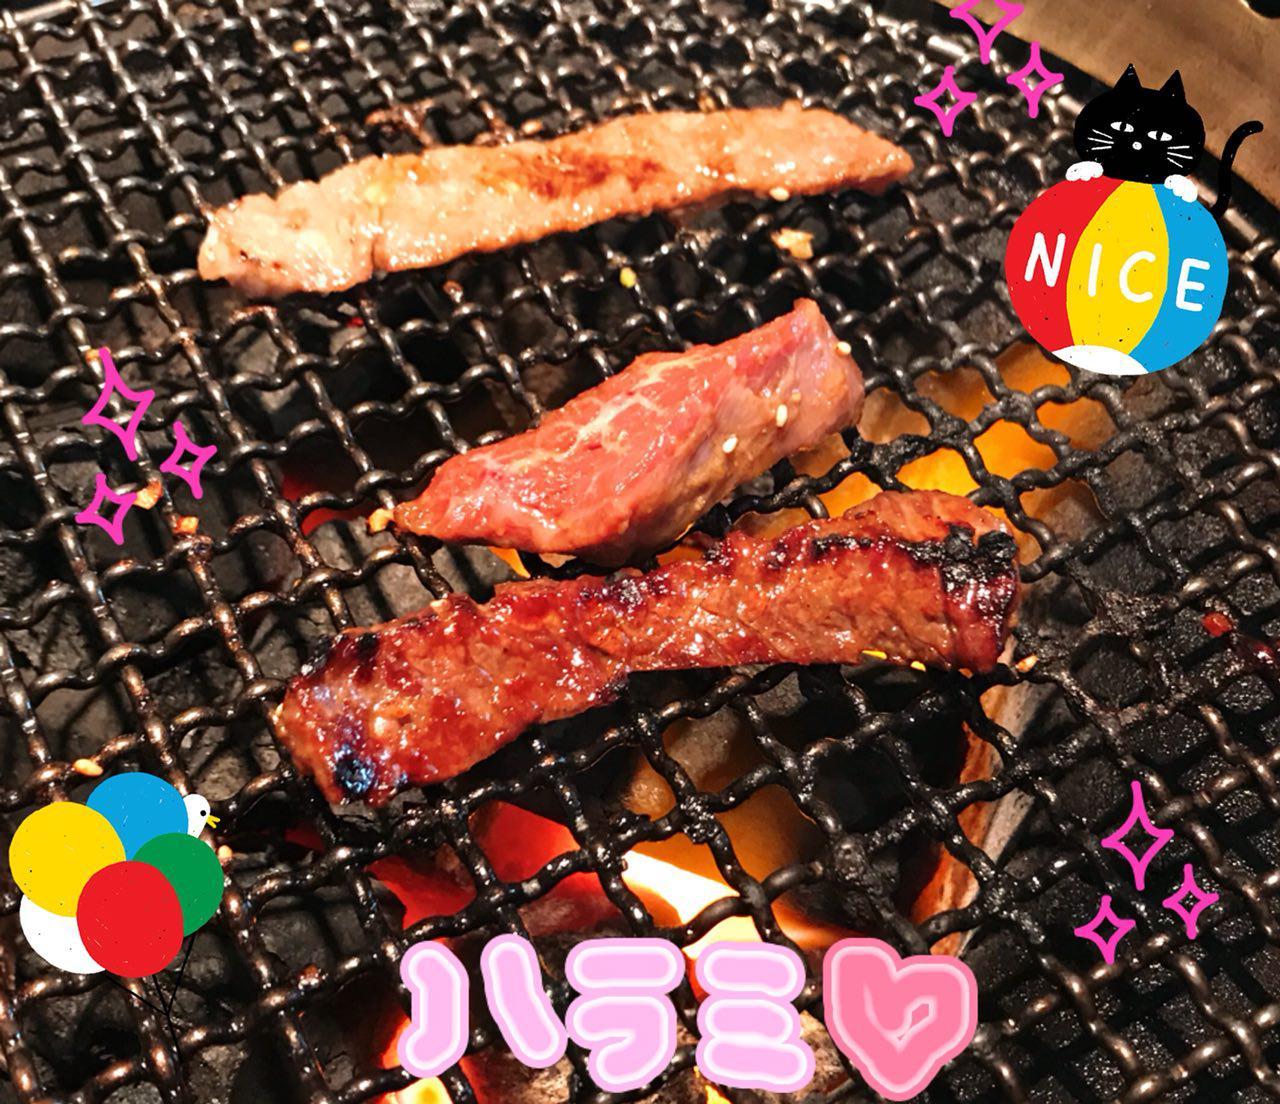 photo_2018-01-31_22-08-43.jpg